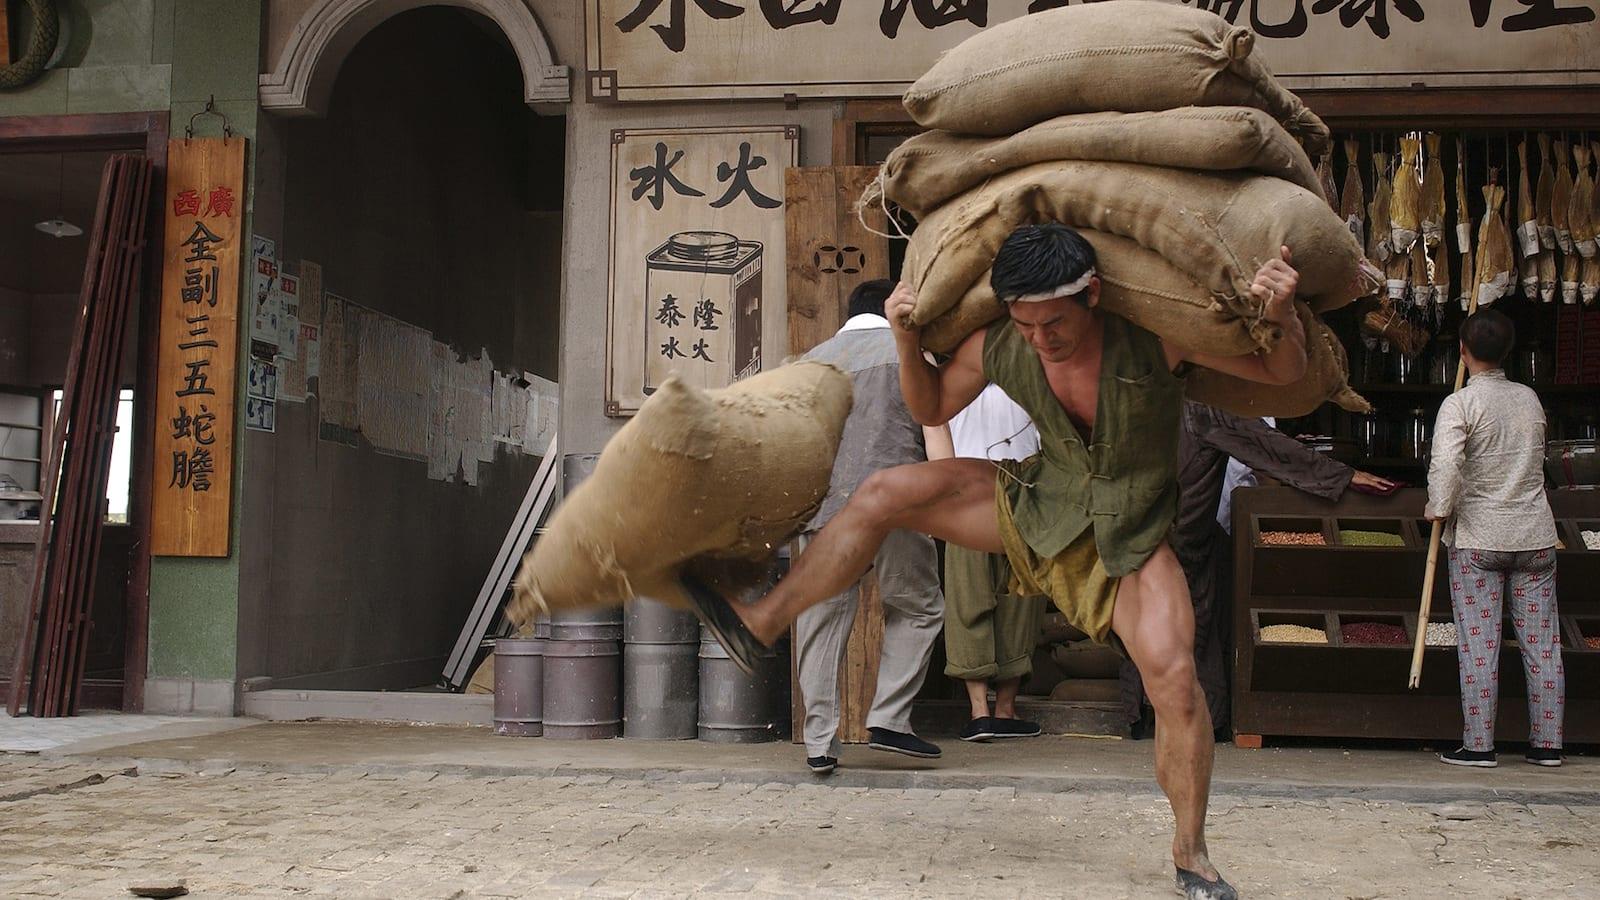 kung-fu-hustle-2004